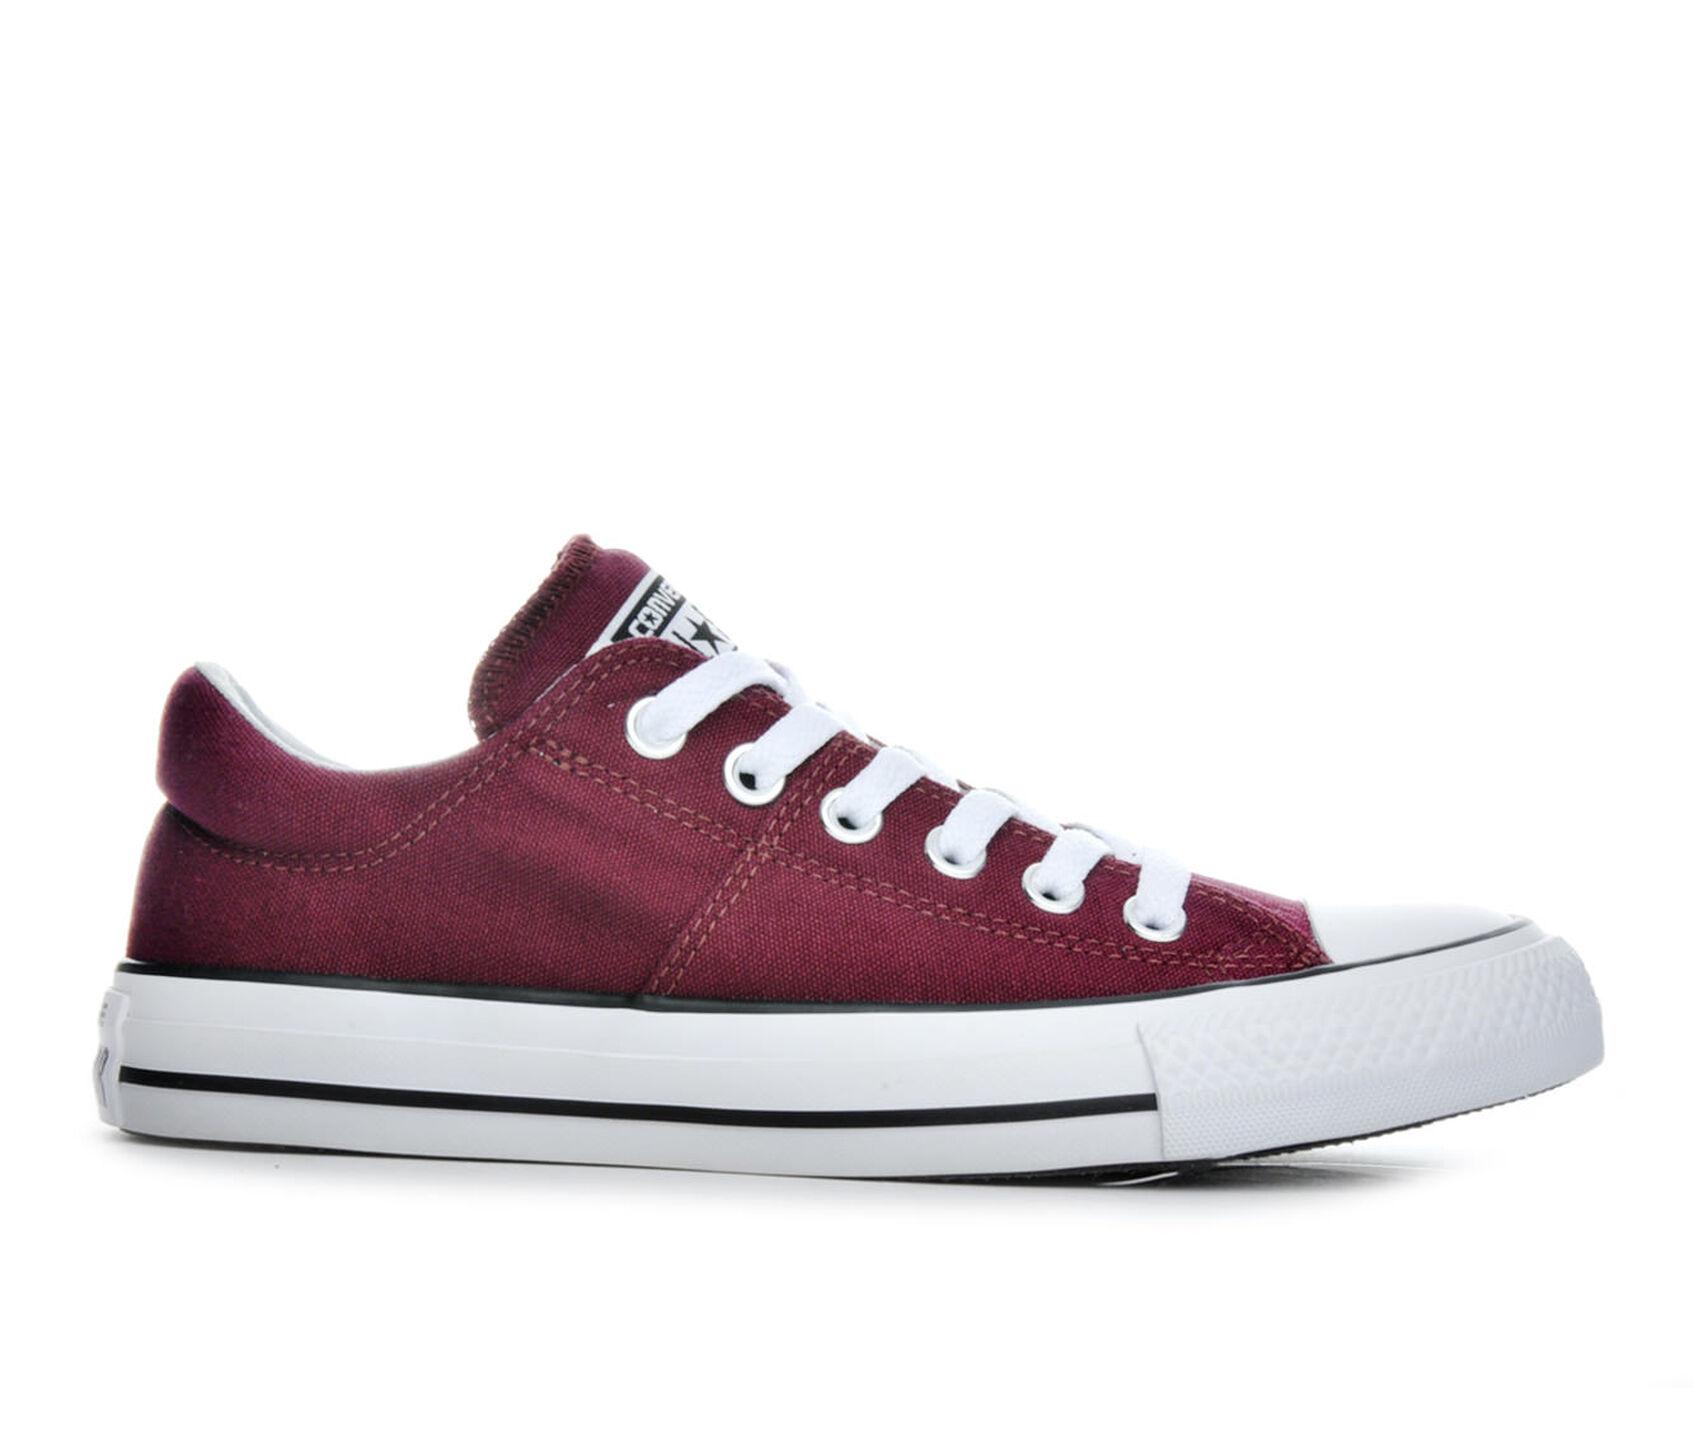 Womens Converse Shoes Shoe Carnival